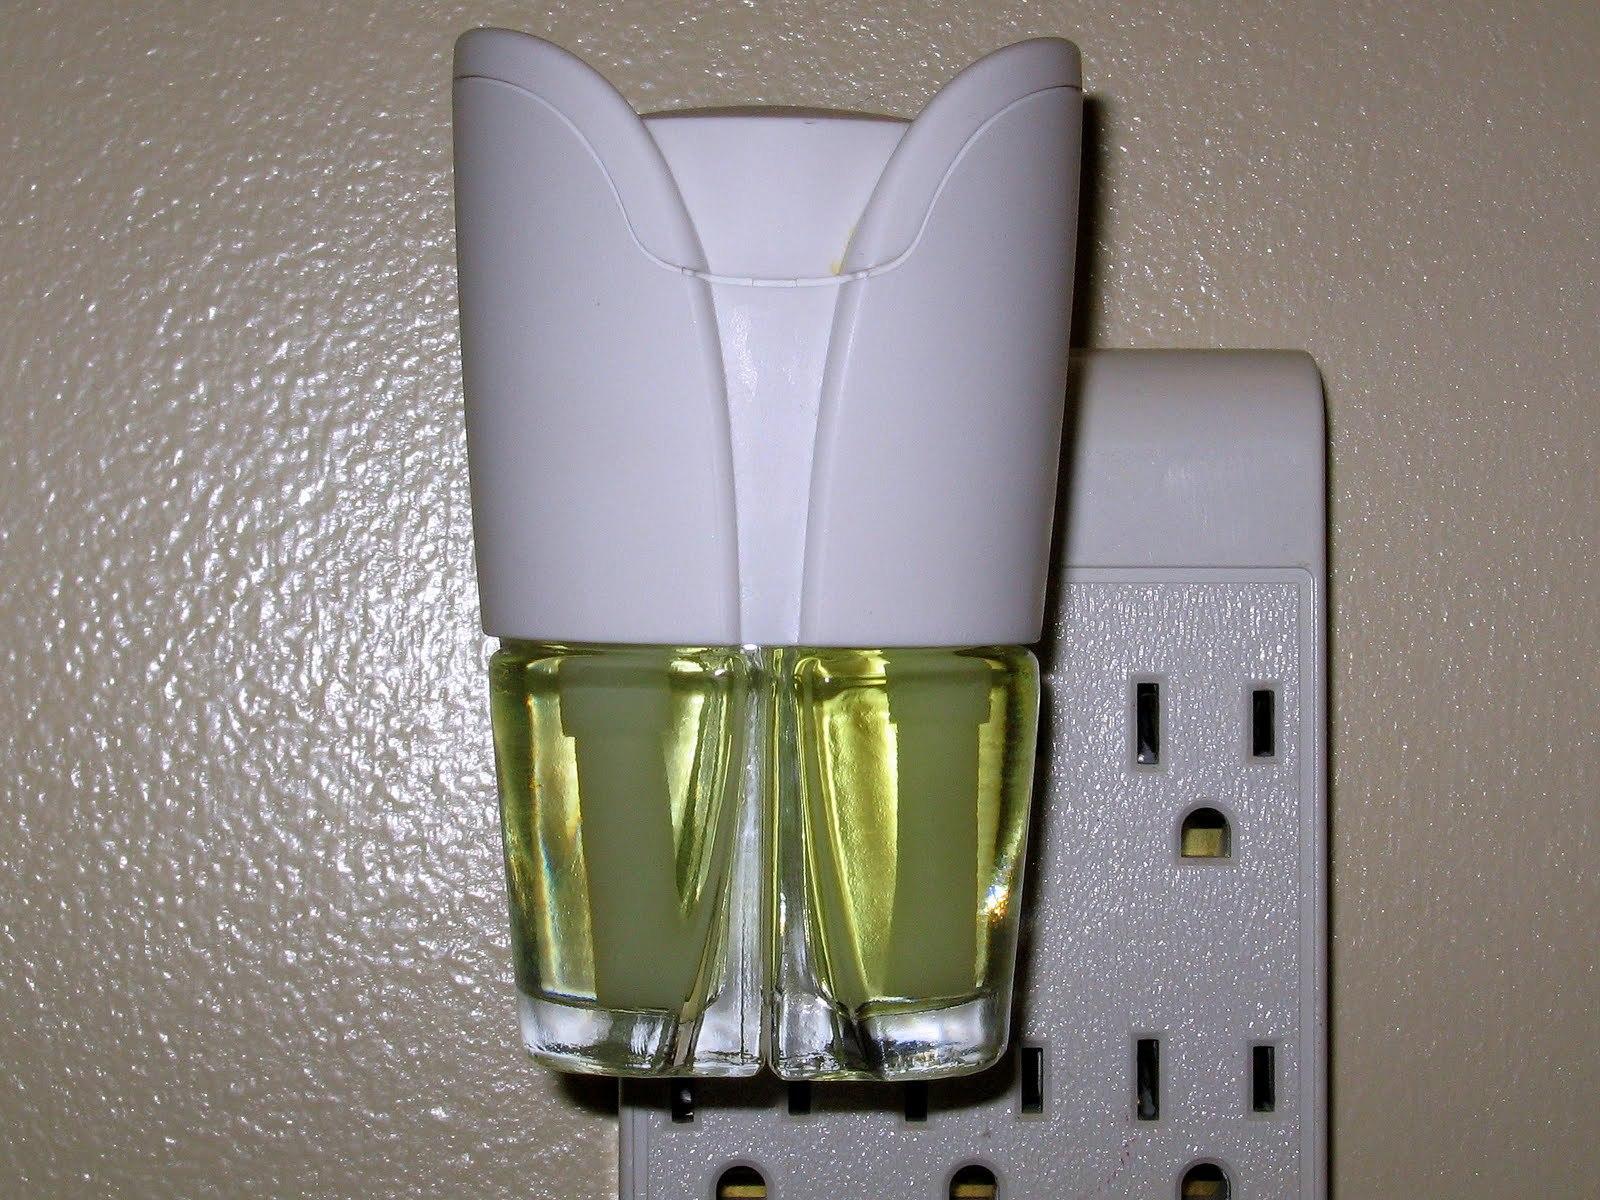 Febreze NOTICEables Dual Scented Pluggable Air Freshener